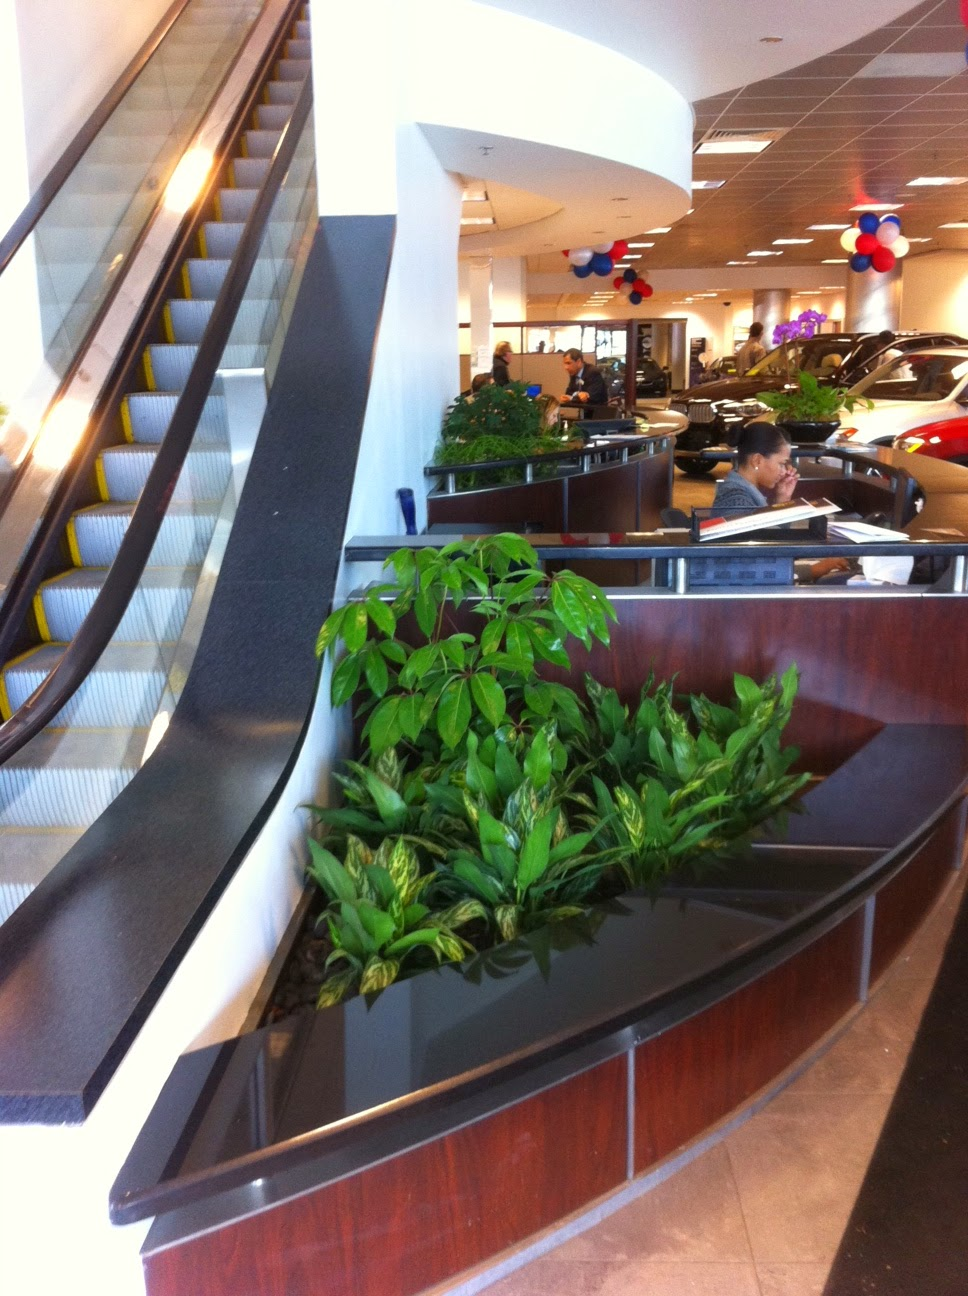 planter of interior green plants low light by Plantscape Designs Inc.